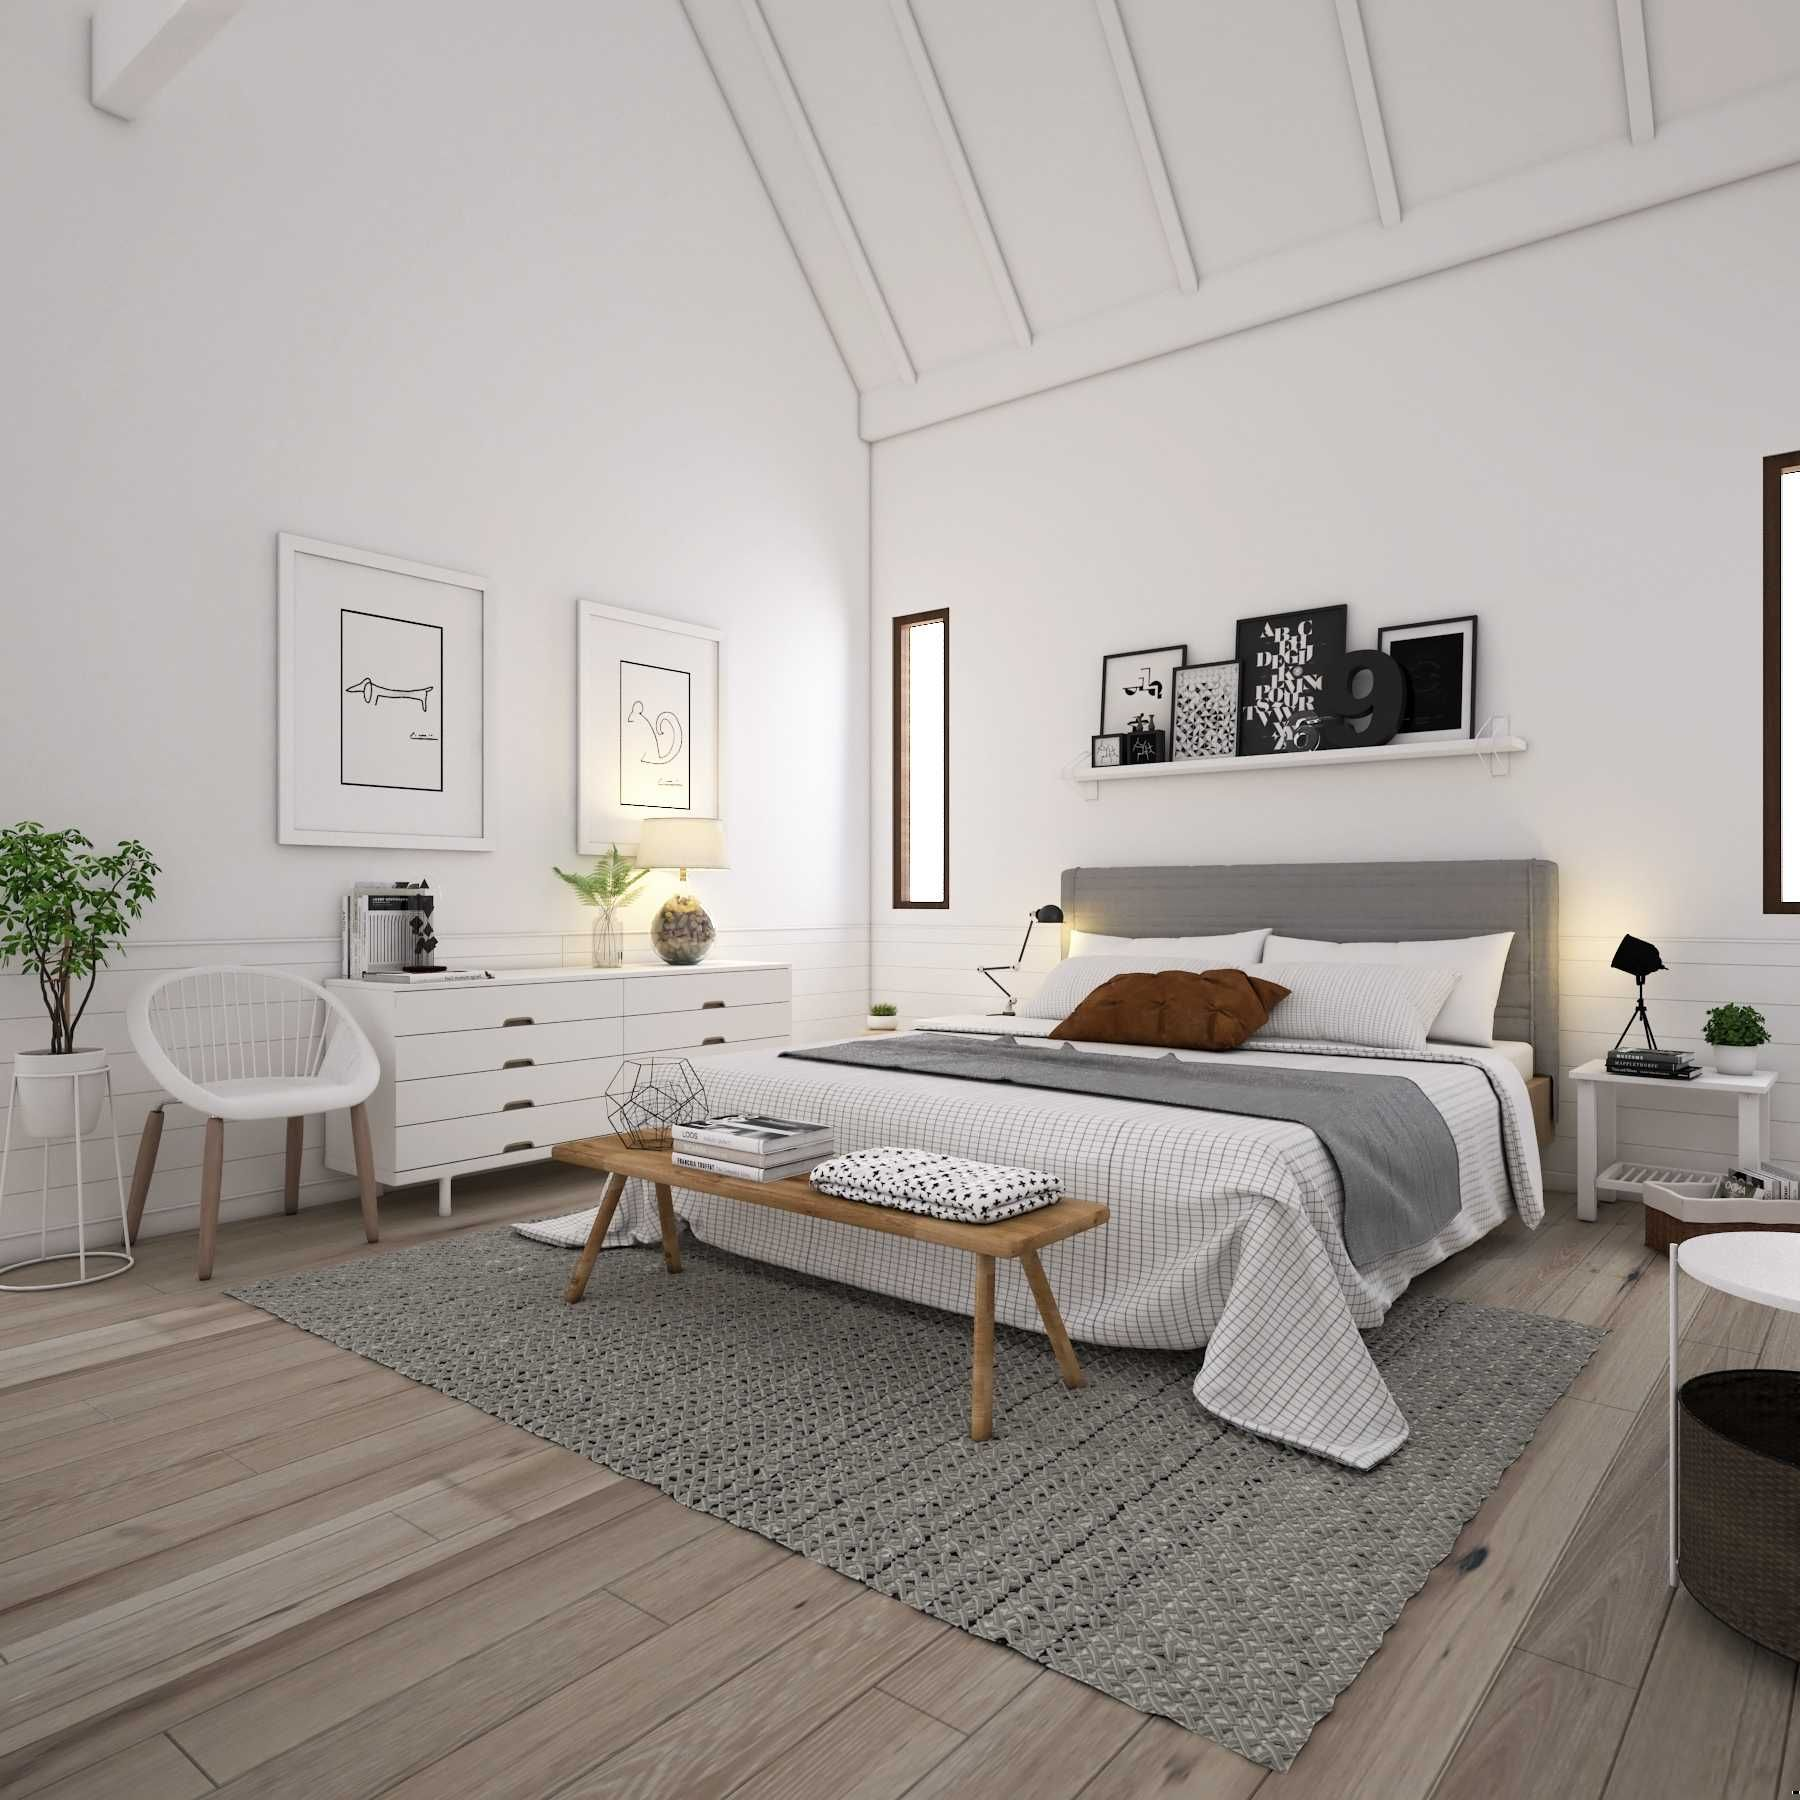 Scandinavia Bedroom Scandinavian House Medan Sumatra Utara La Casa Interior Wood Bedroom Design Home Decor Bedroom Master Bedrooms Decor